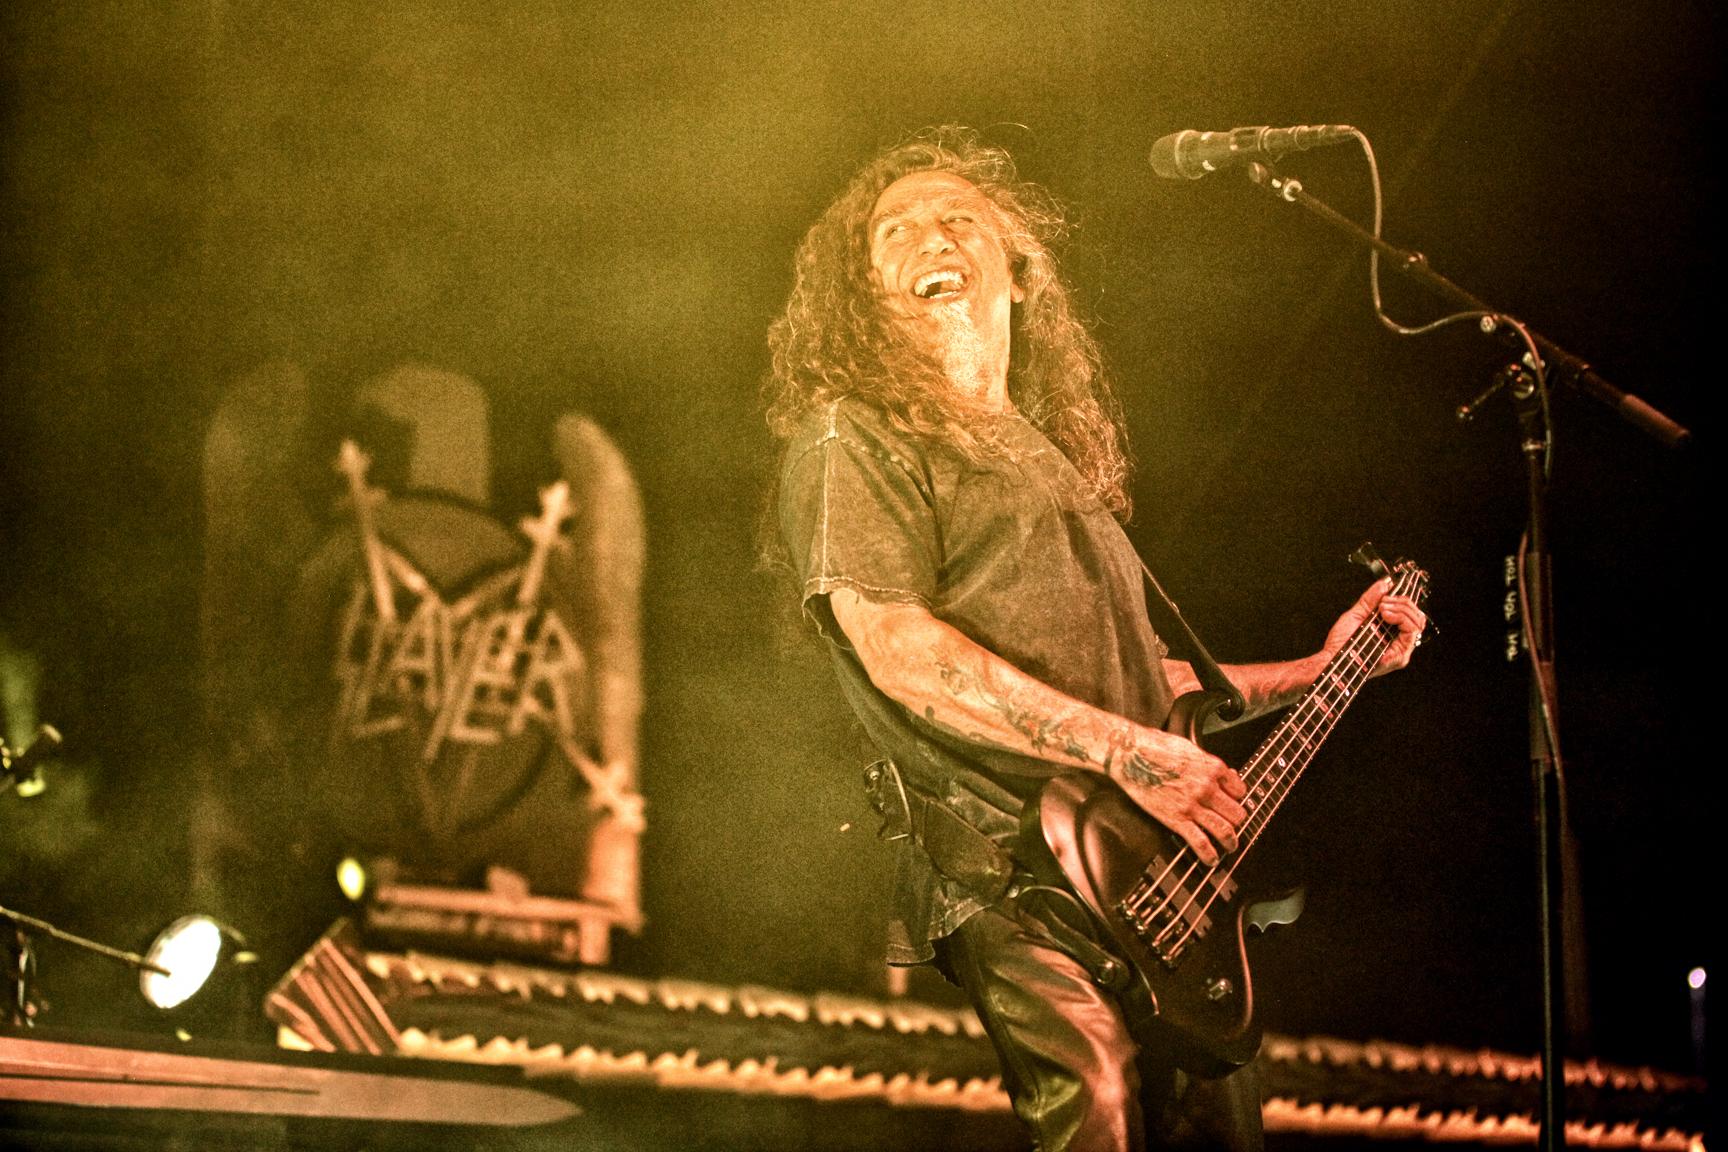 Slayer's Tom Araya Picks 4 Favorite Bass Players